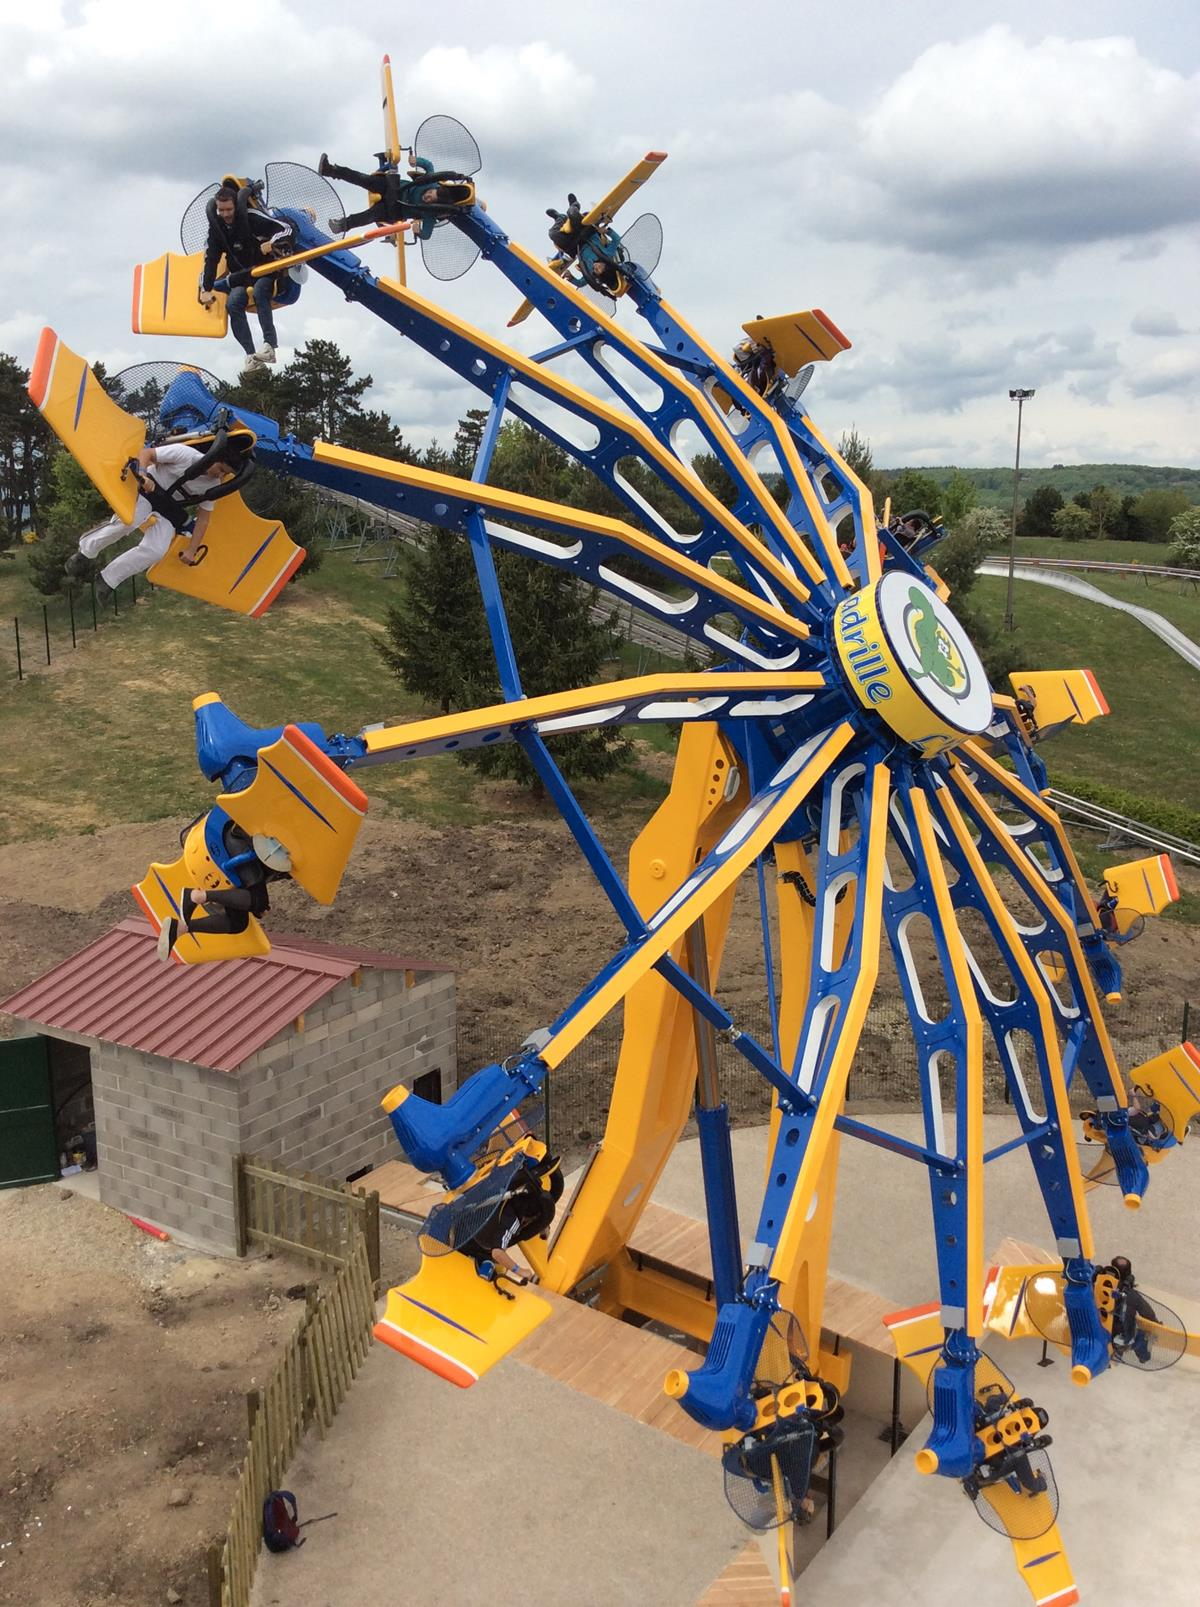 Aerobat flying ride amusement ride for amusement park